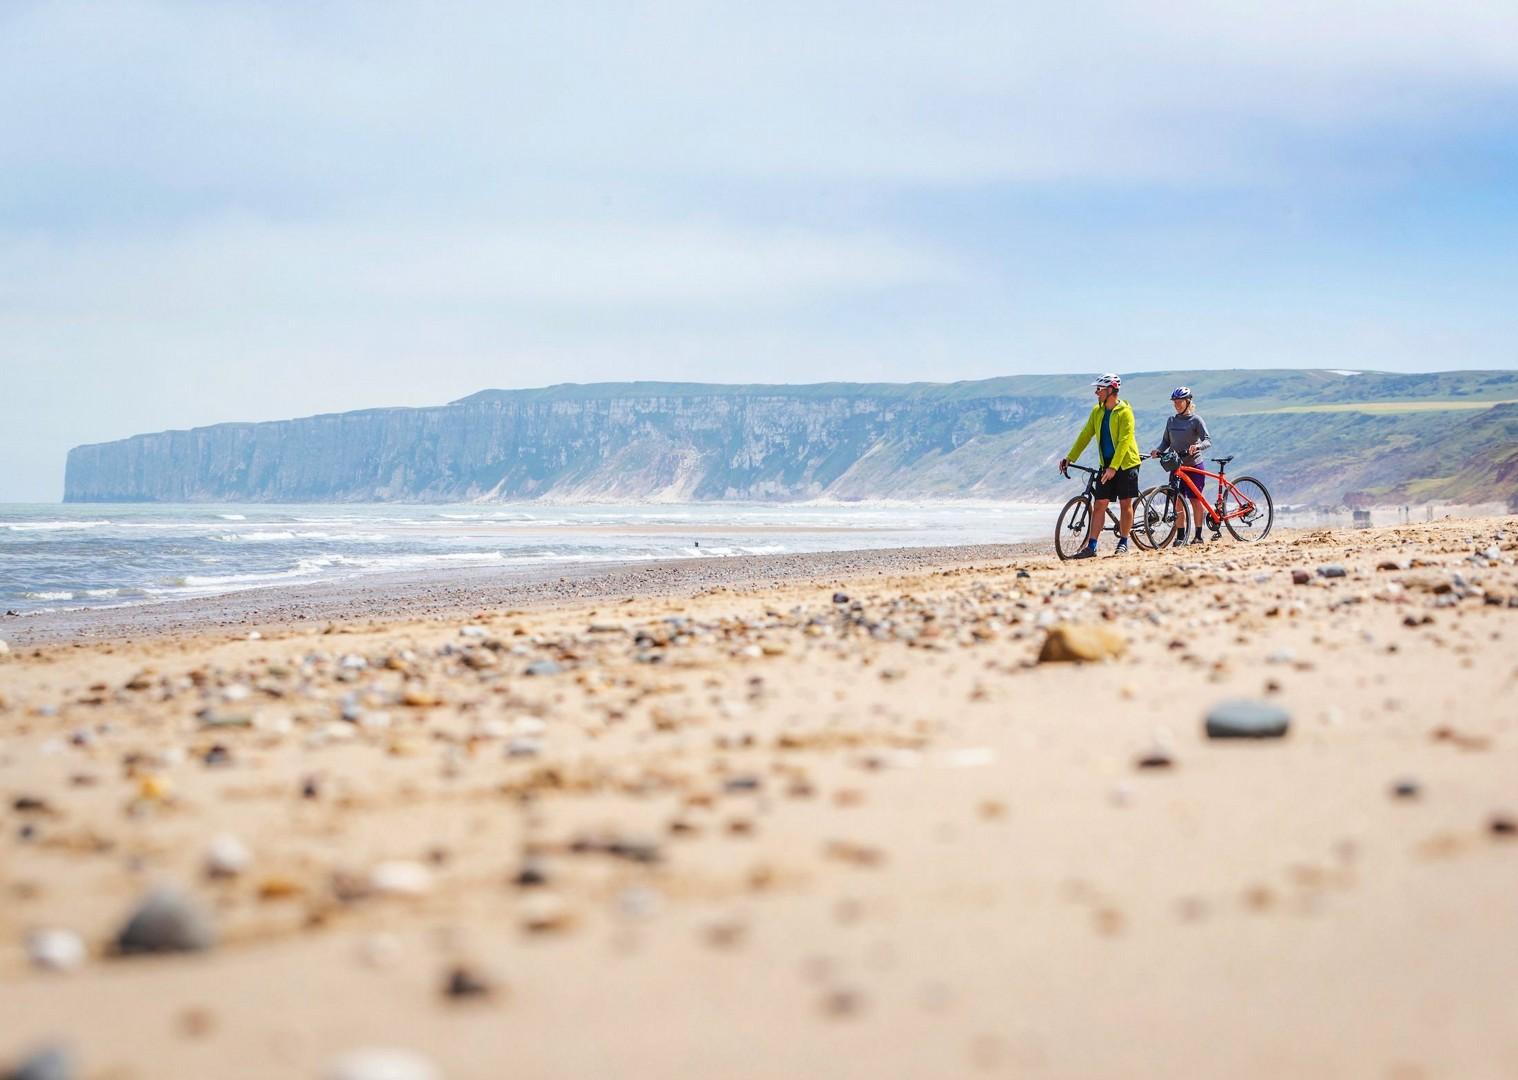 bridlington-yorkshire-cycling-tour-saddle-skedaddle.jpg - NEW! UK - Yorkshire Wolds - Leisure Cycling